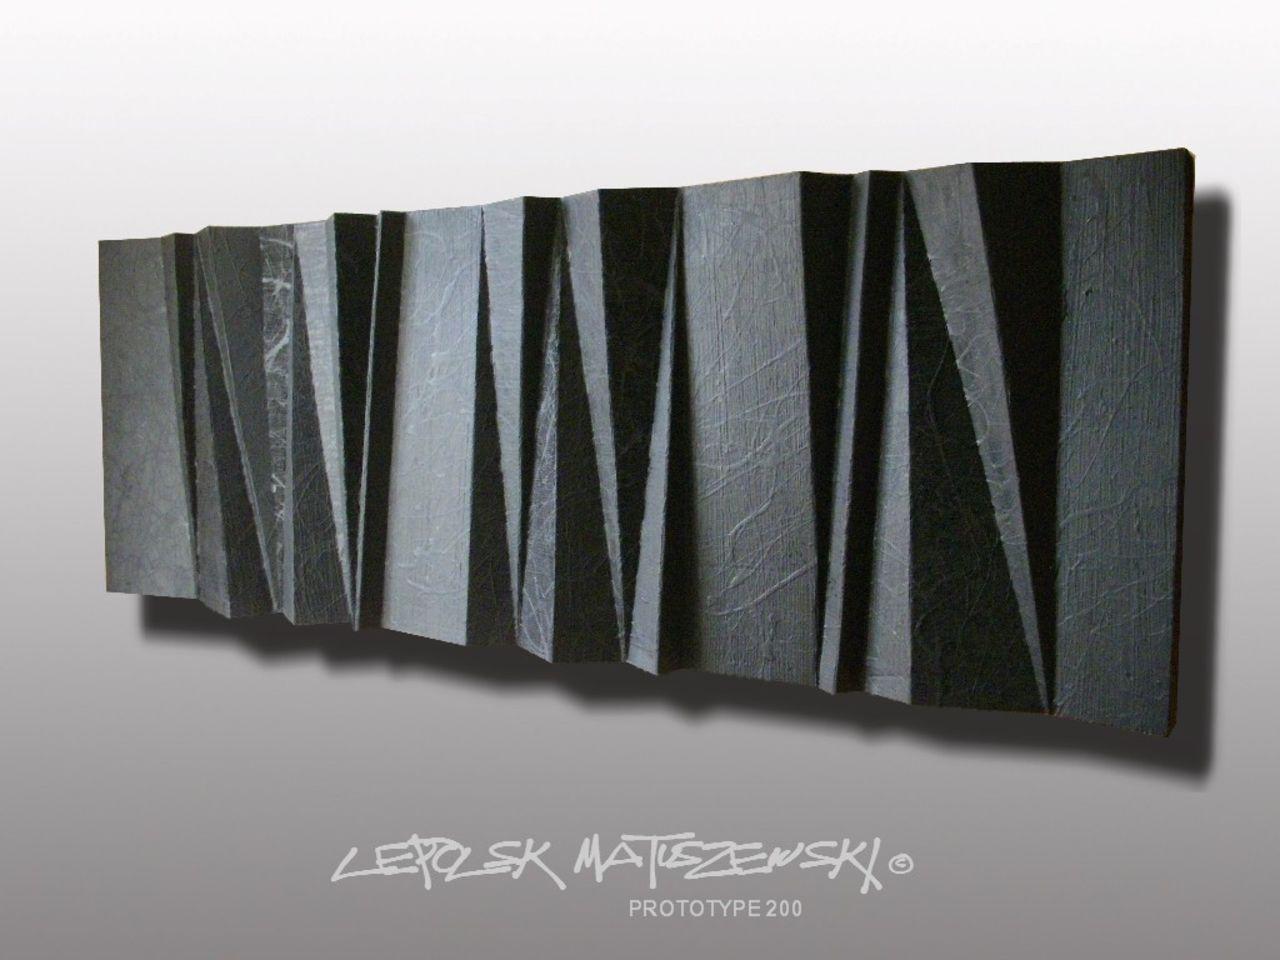 MISTER K  (Lepolsk Matuszewski) PROTOTYPE 200  expressionnisme abstrait